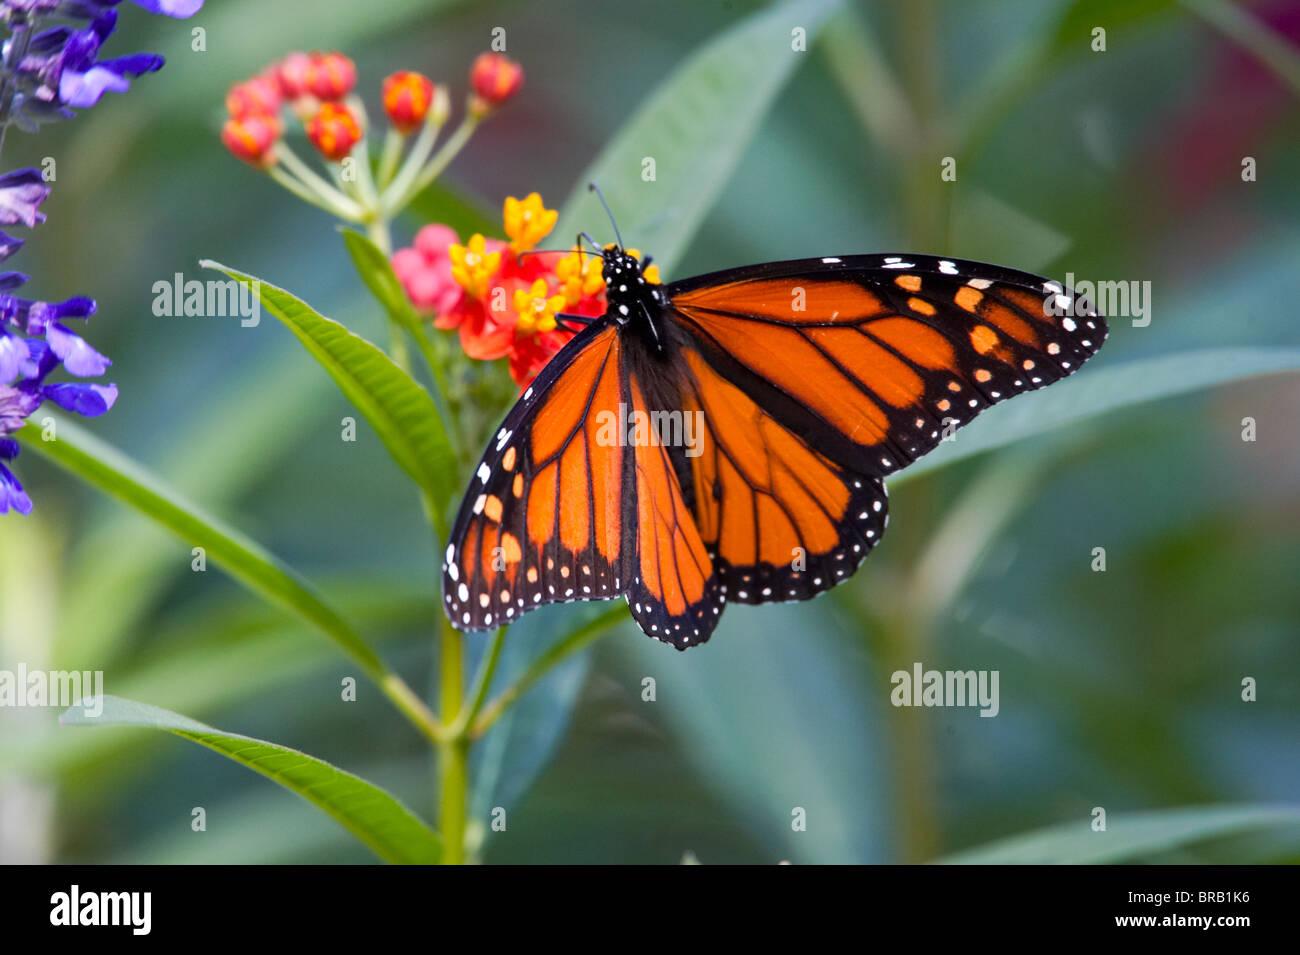 Monarch Butterfly Feeding on Milkweed Flowers - Stock Image